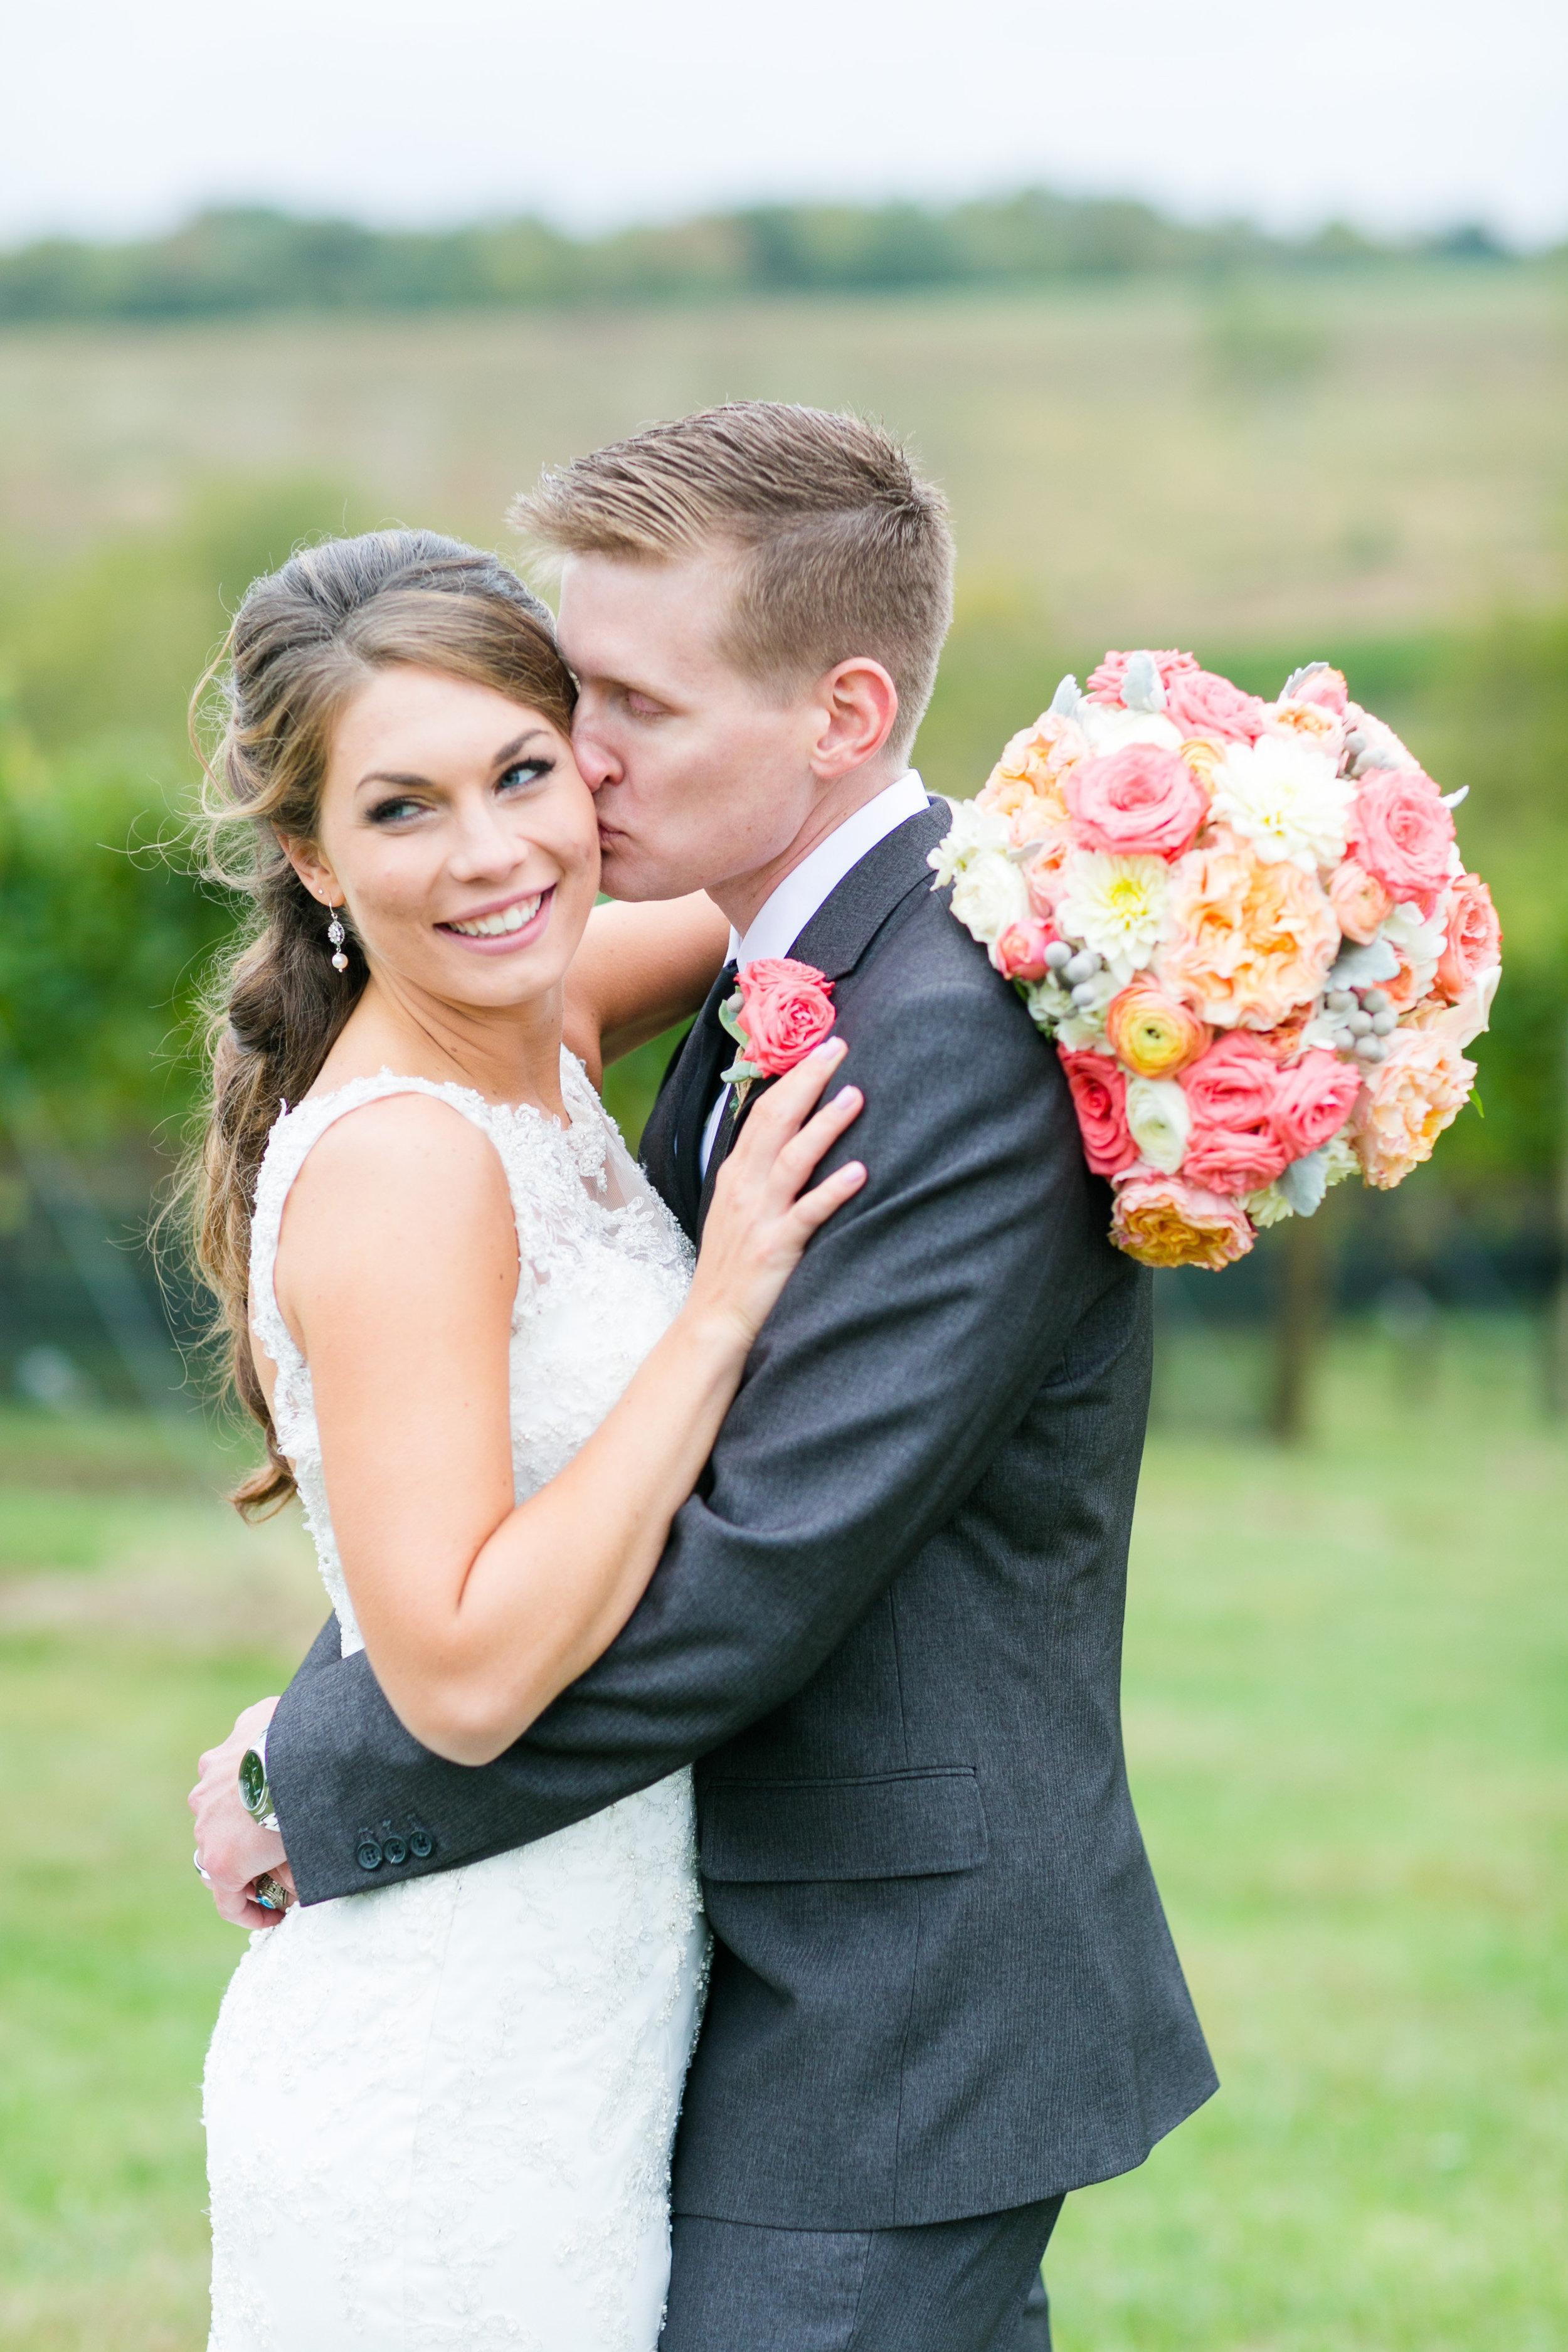 Stone Tower Winery Wedding Photos Virginia Wedding Photographer Megan Kelsey-20.jpg